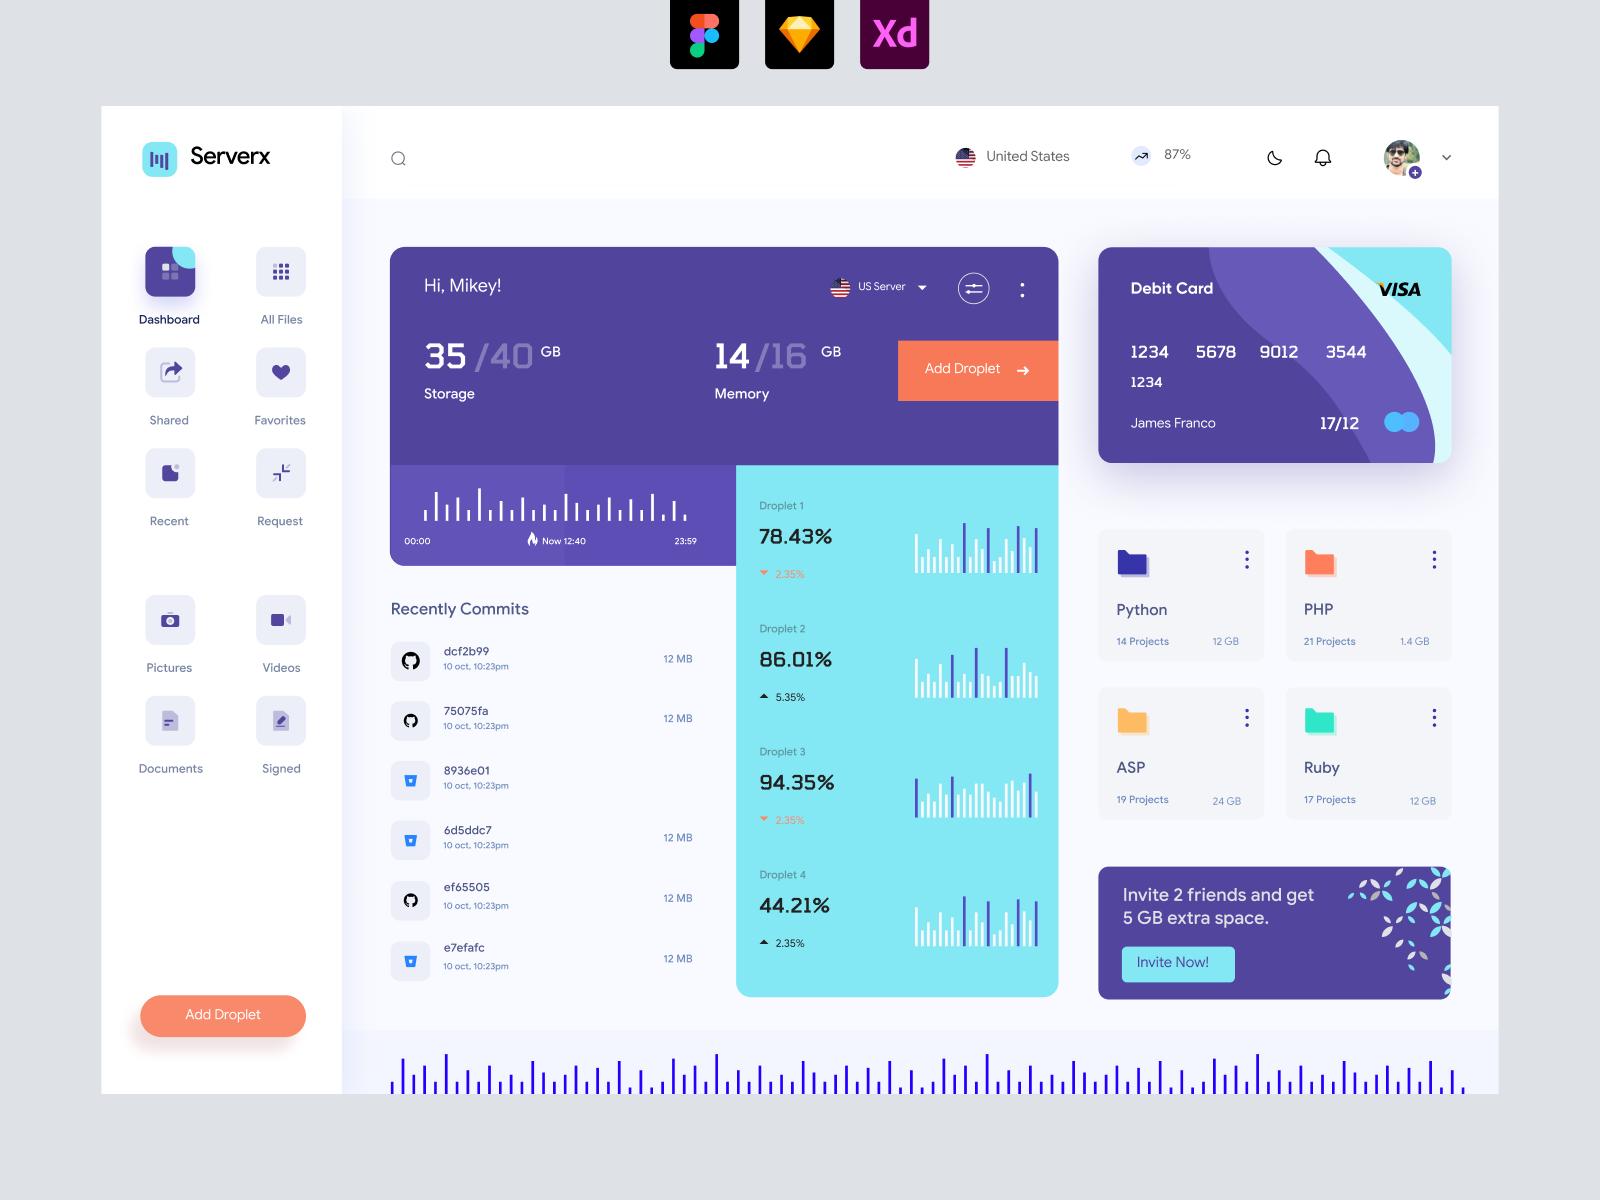 Travel Agency Dashboard UI design